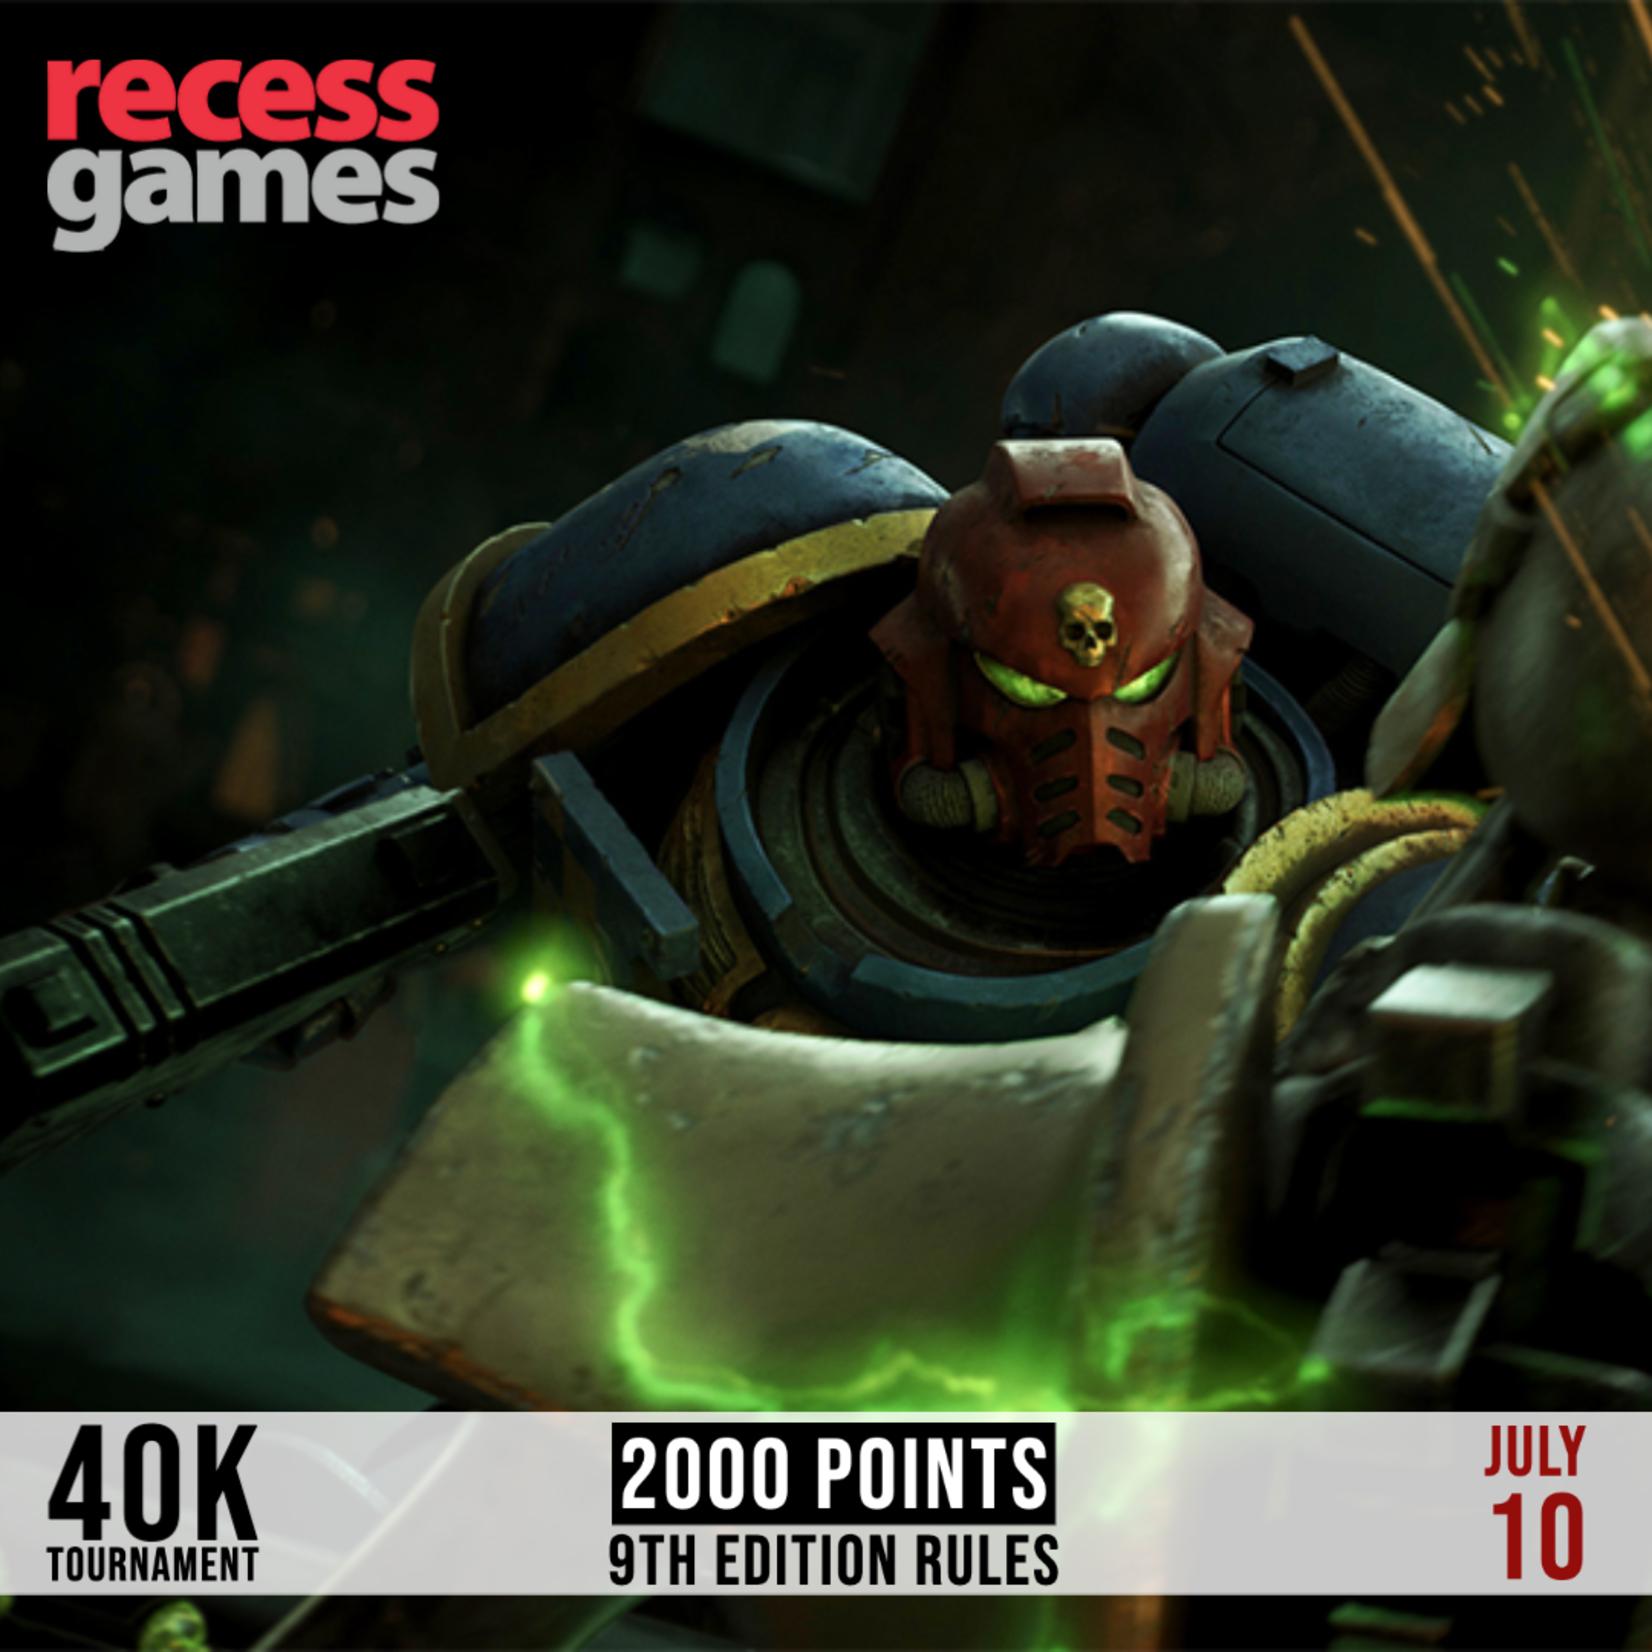 Recess 40k Tournament - July 10, 2021